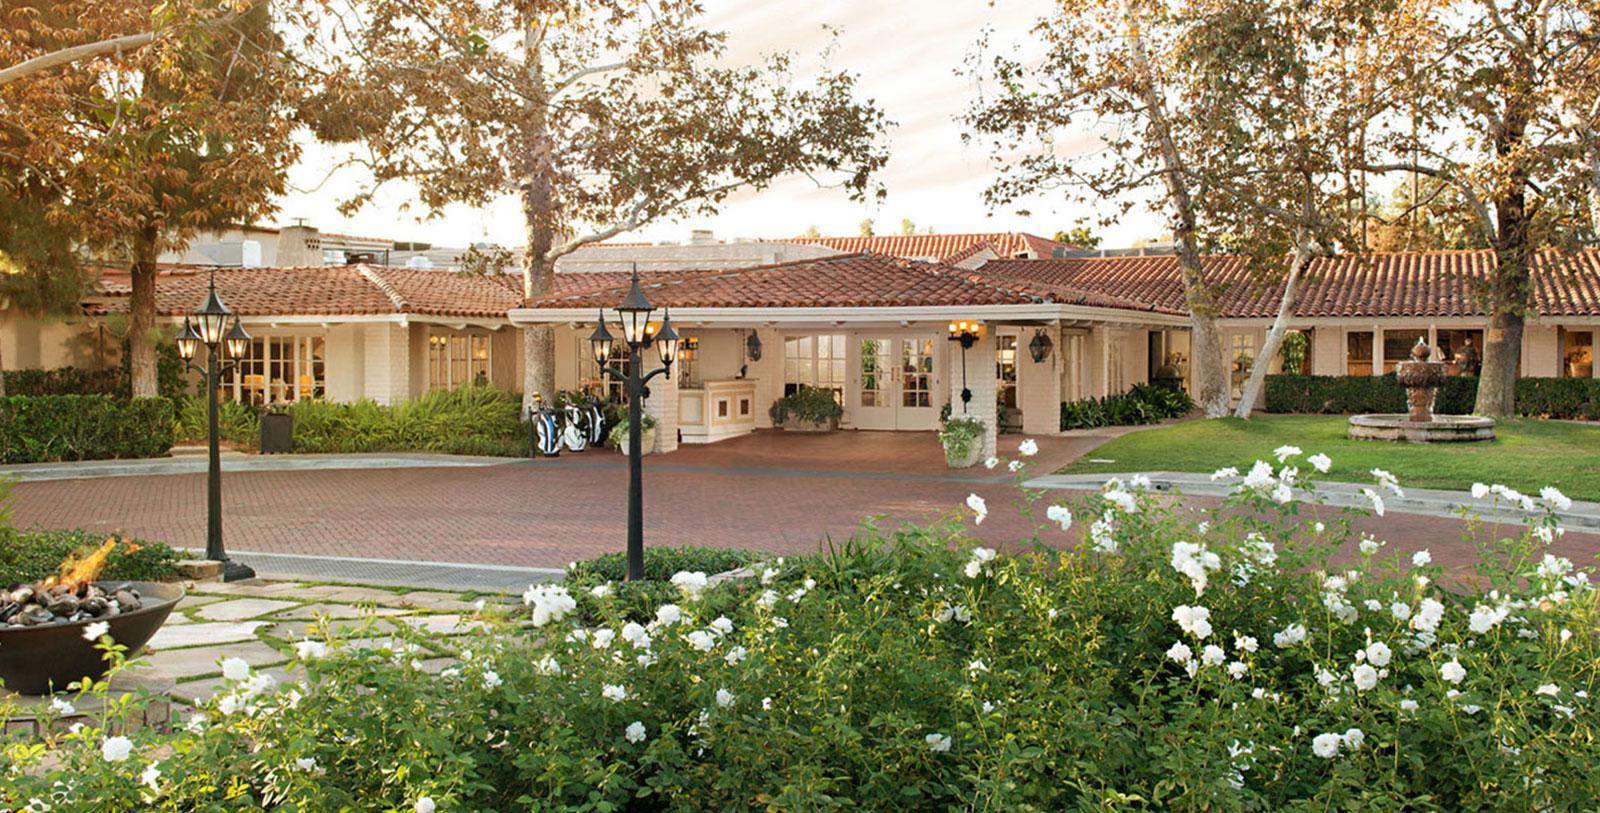 Image of Hotel Exterior, Rancho Bernardo Inn, 1963, Member of Historic Hotels of America, San Diego, California, Overview